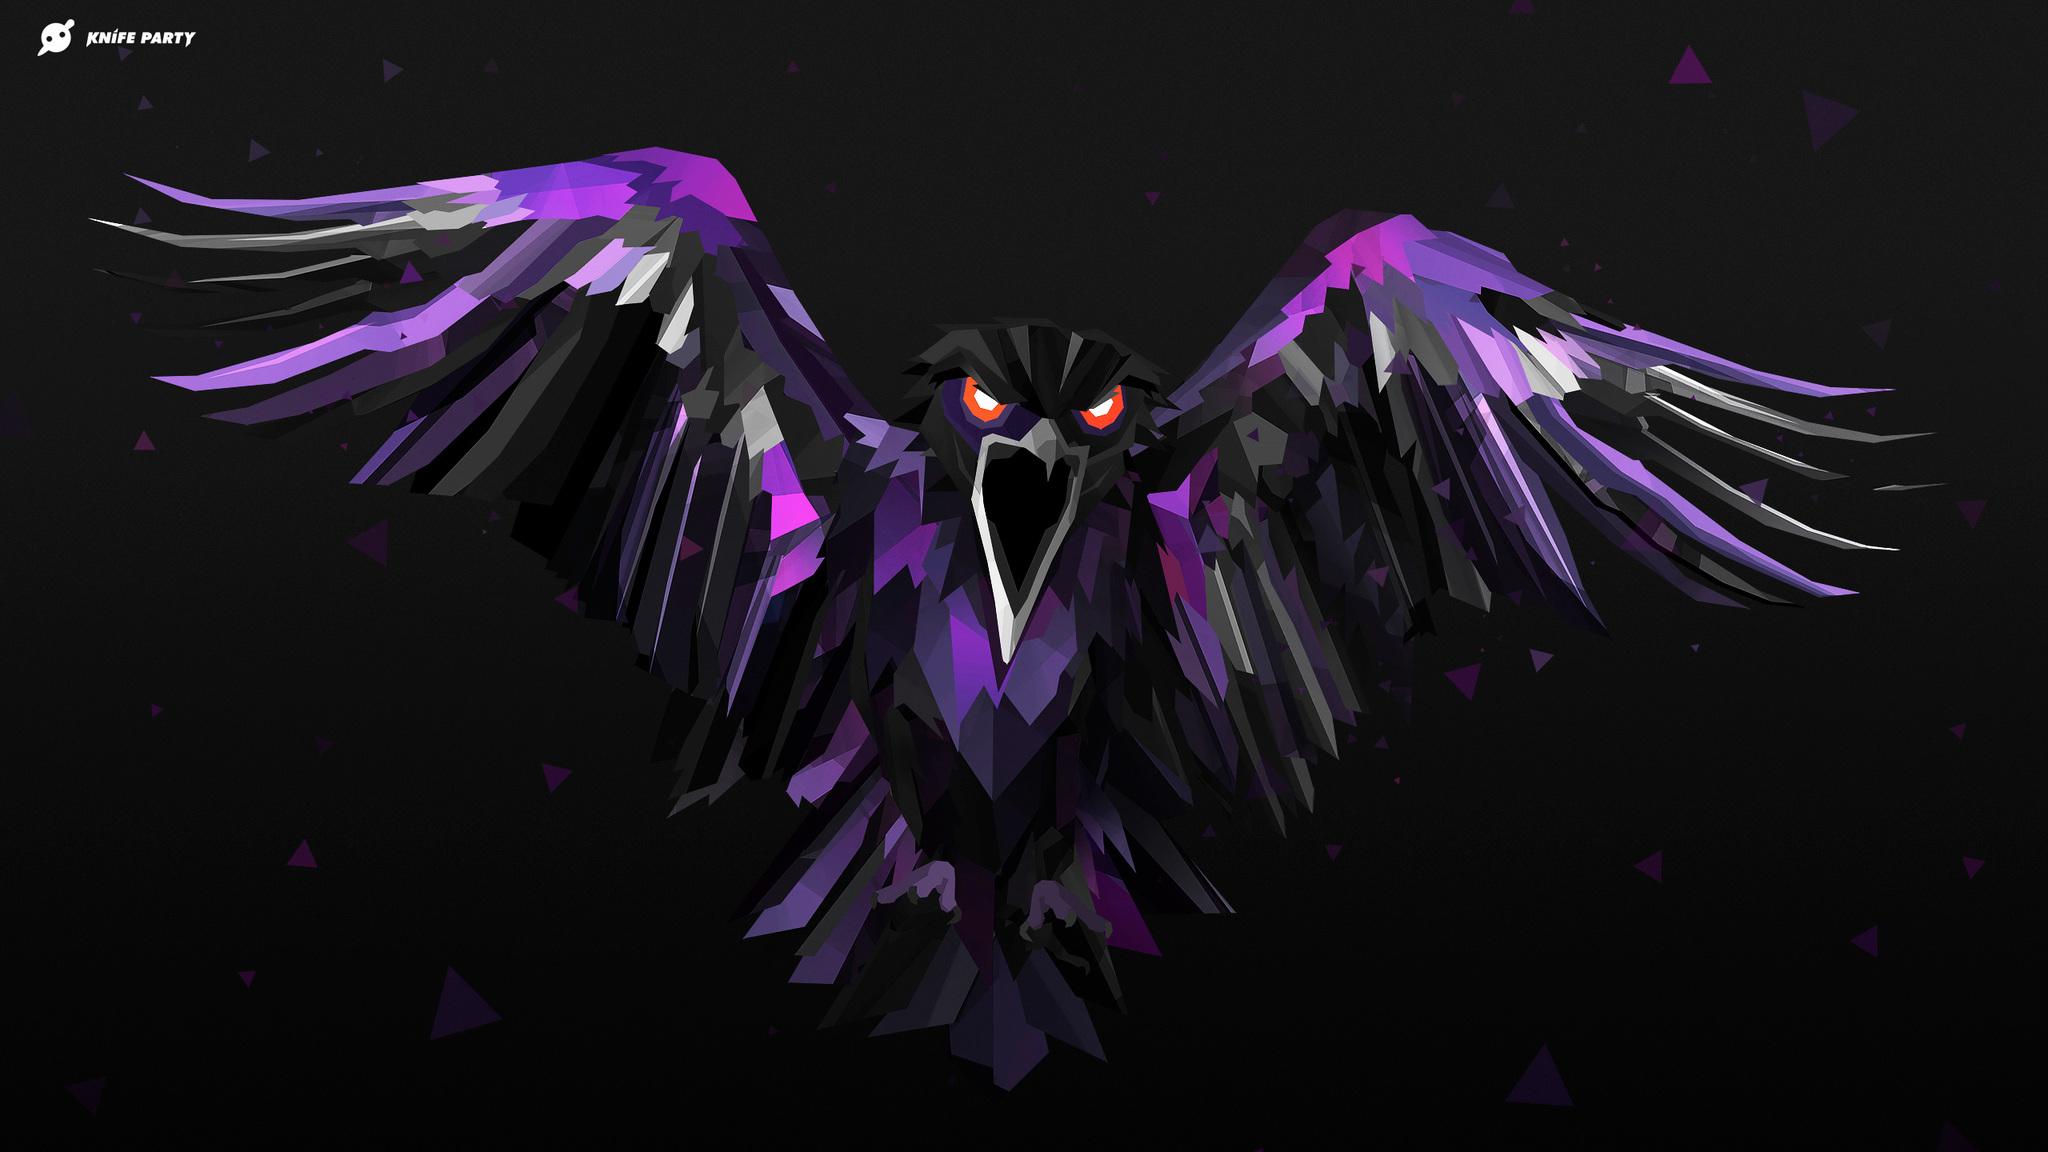 2048x1152 Pubg Artwork 4k 2048x1152 Resolution Hd 4k: 2048x1152 Bird Polygon Digital Art 2048x1152 Resolution HD